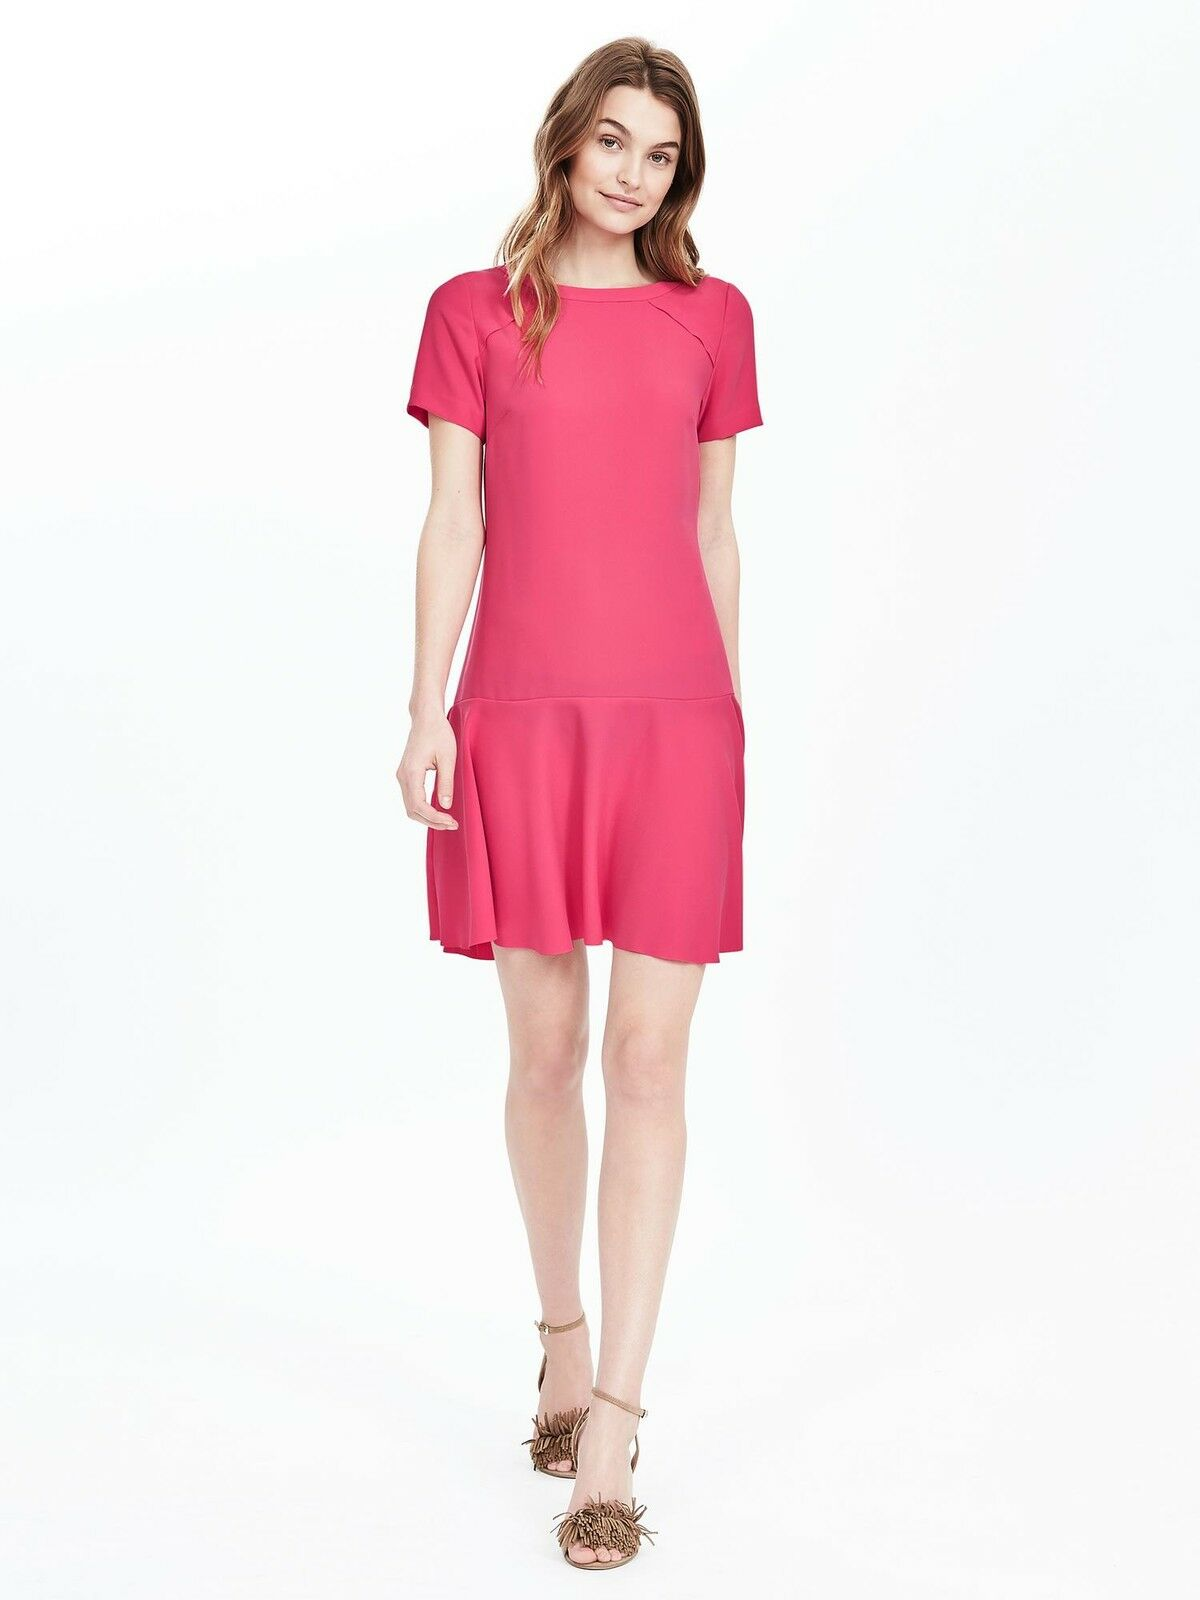 NWT Banana Republic Flounce Dress Kismet Rosa Größe 8P 8 P